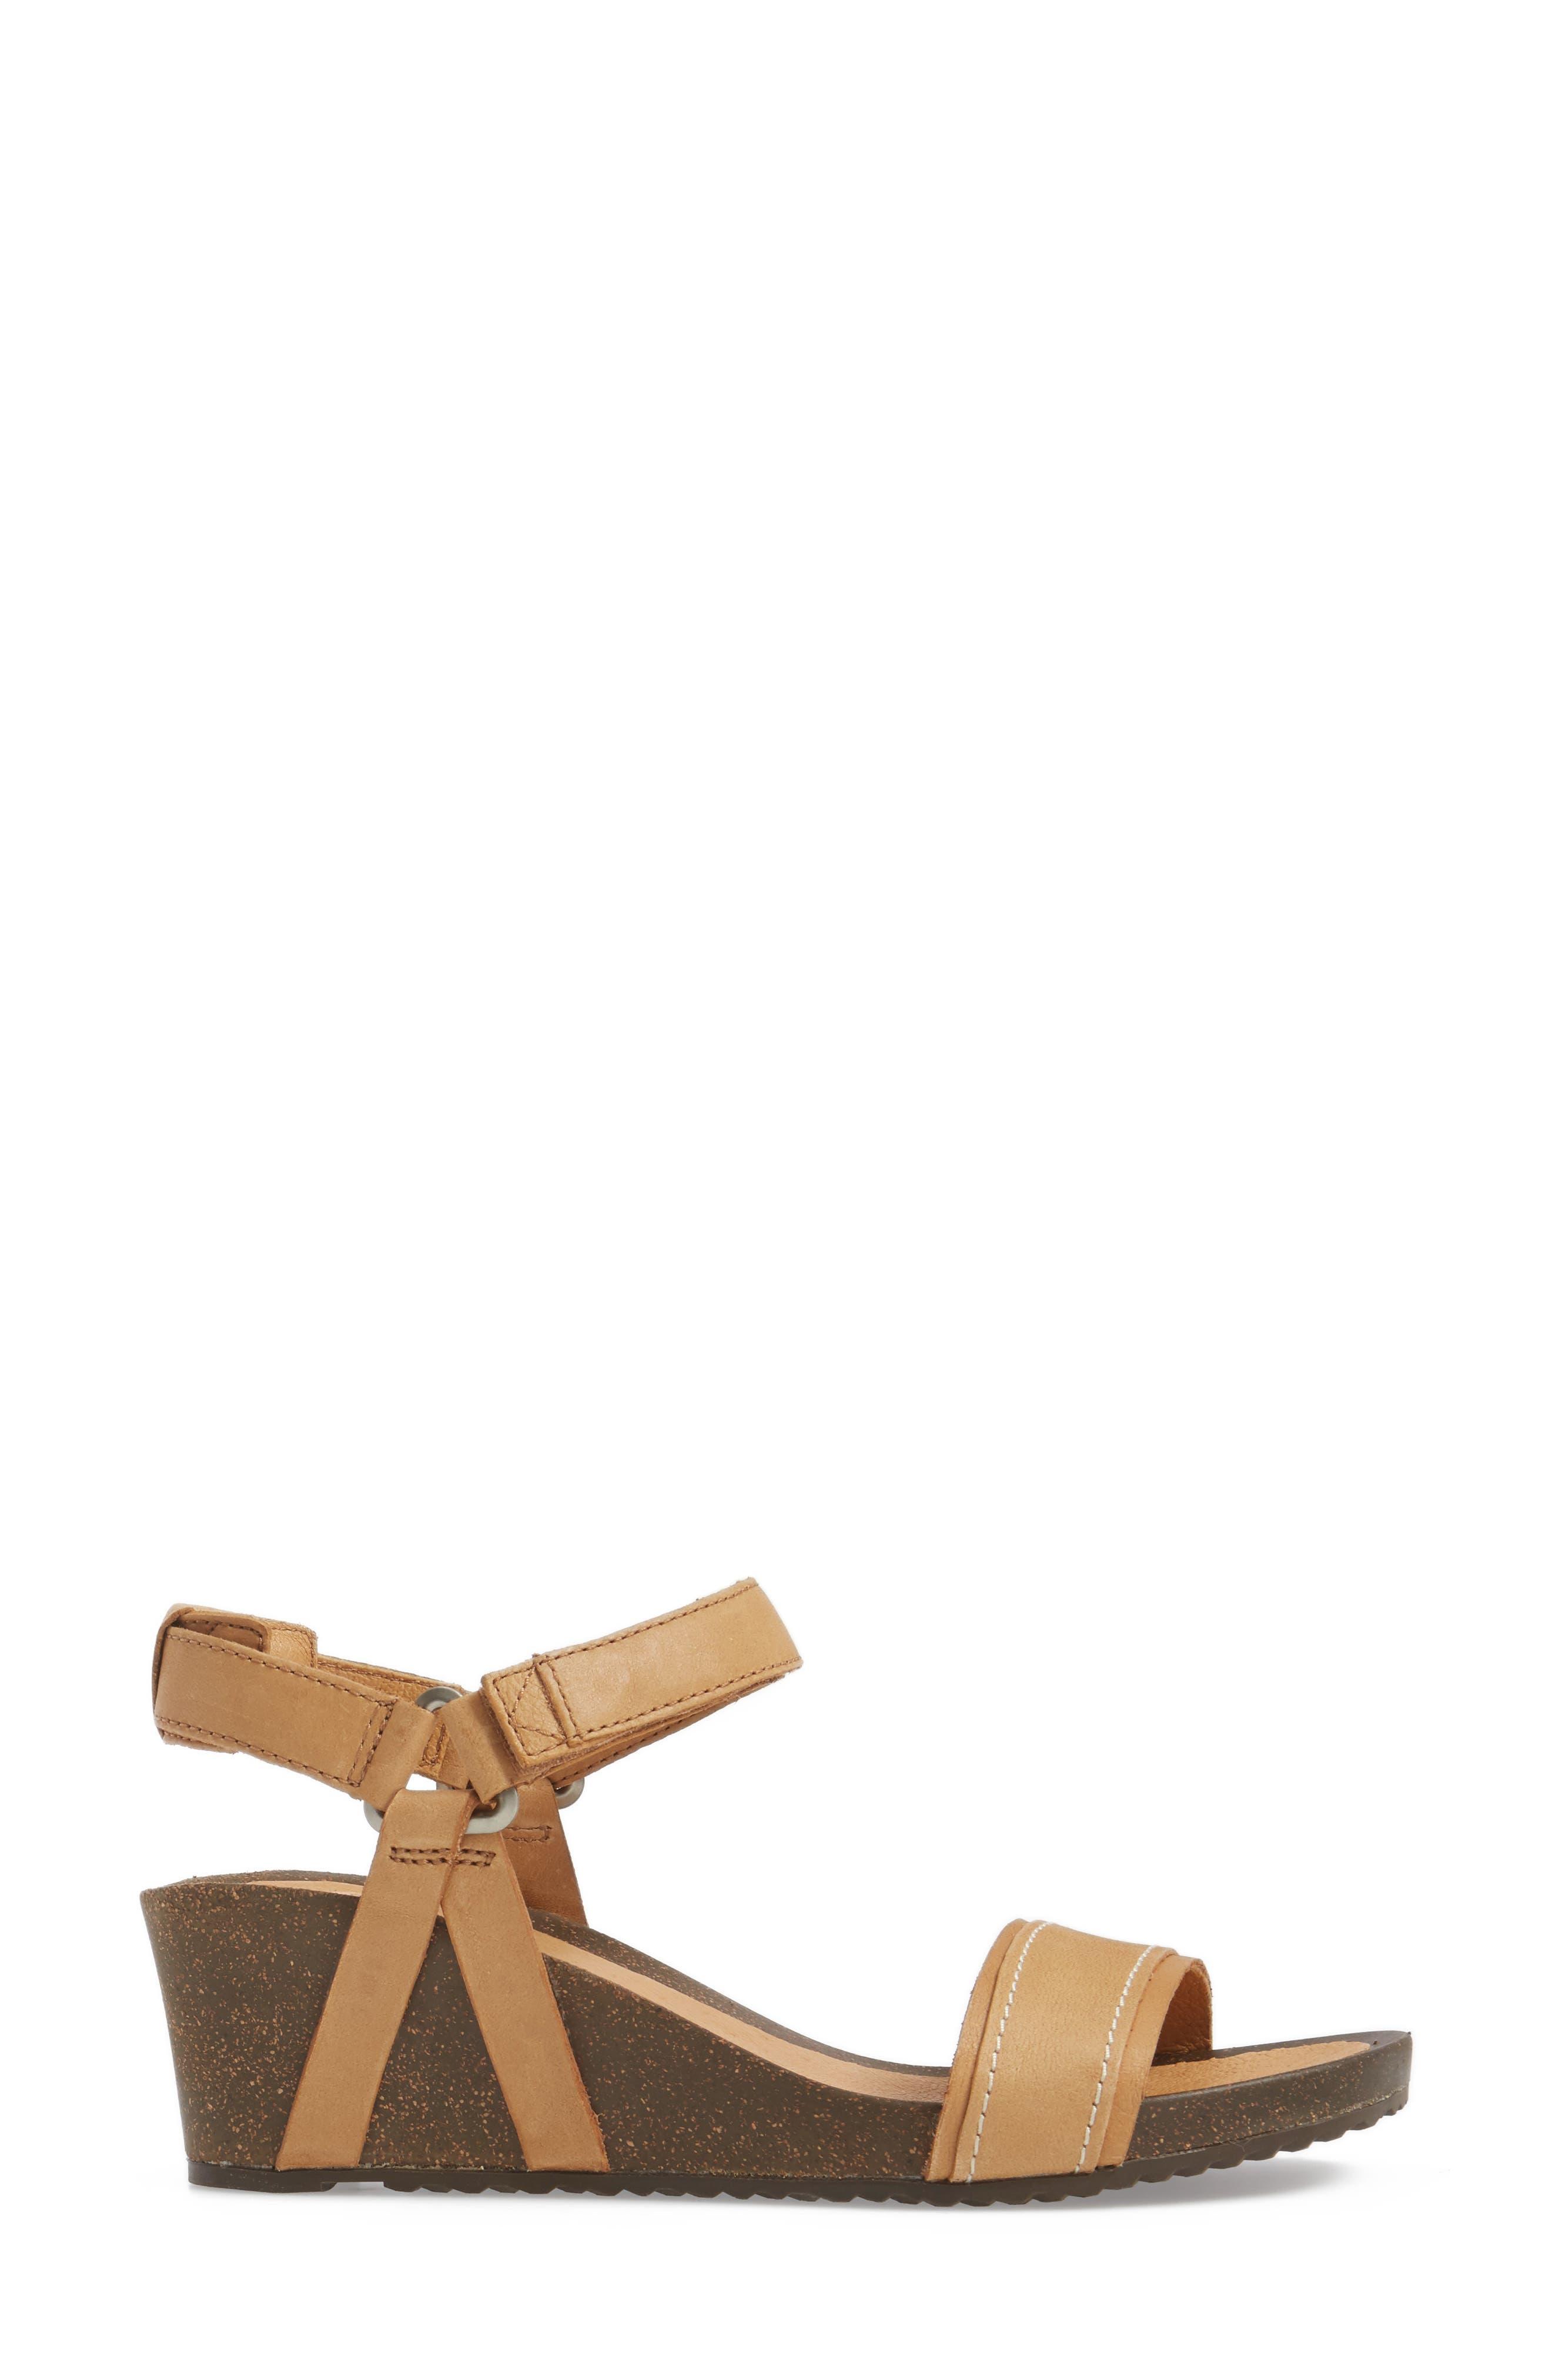 Alternate Image 3  - Teva Ysidro Stitch Wedge Sandal (Women)